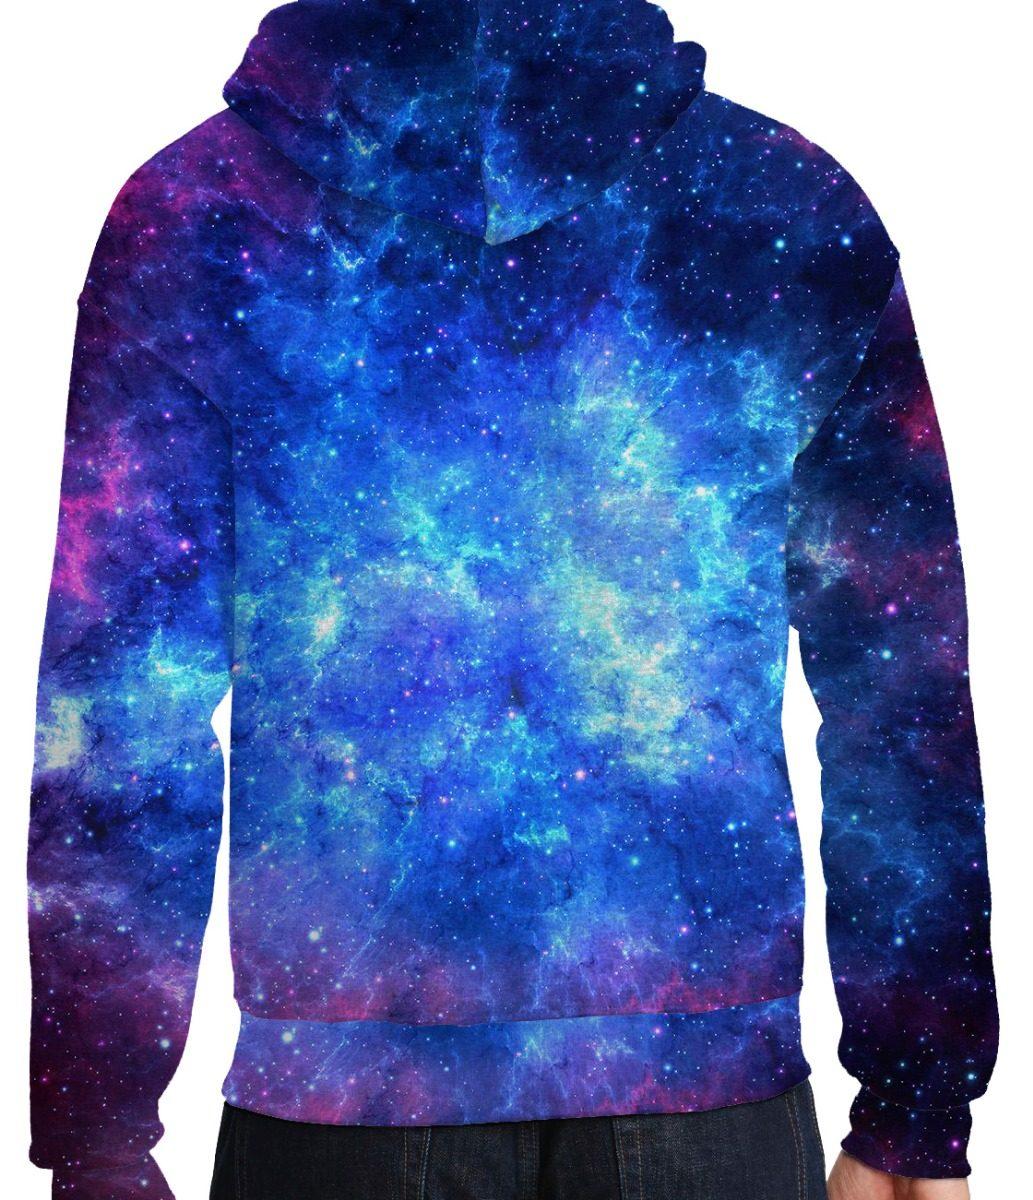 a04b761d9 blusa moletom bolso lateral capuz tumblr galaxia unicornio. Carregando zoom.